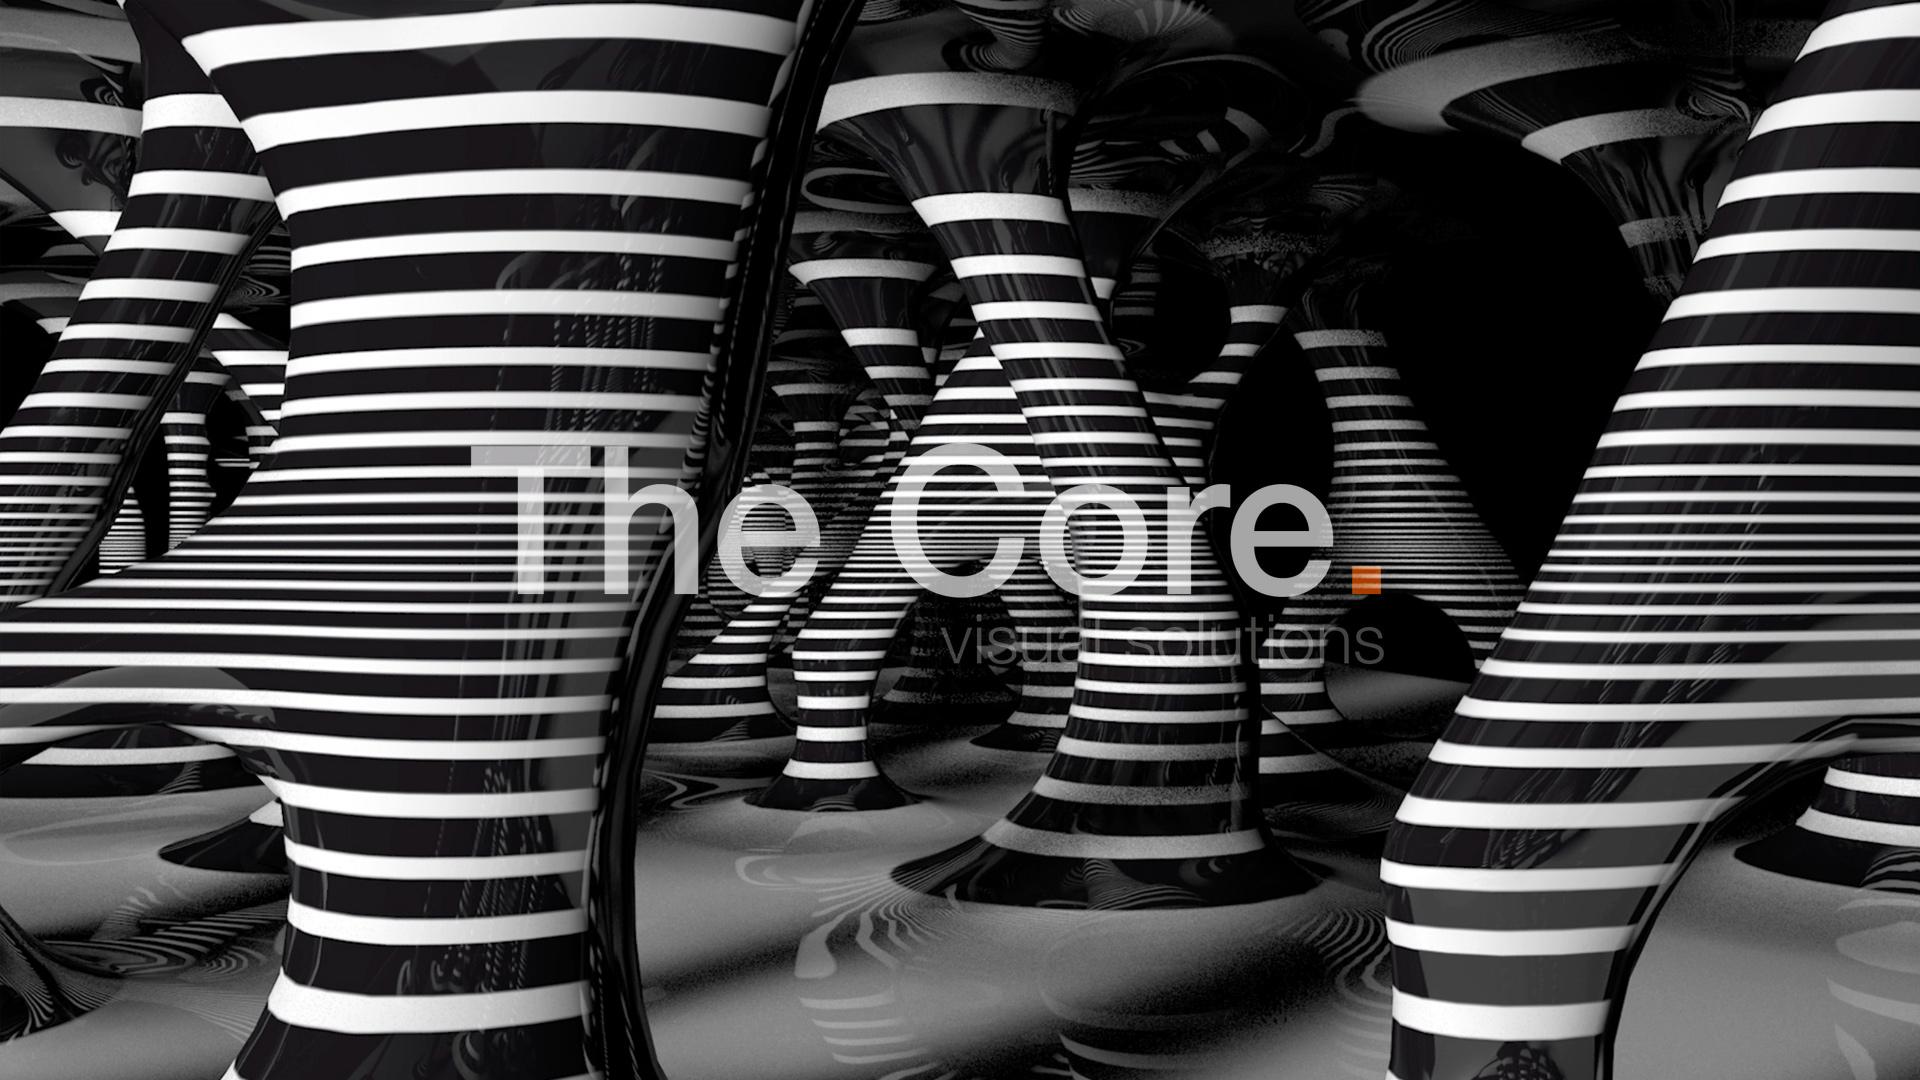 00236-PILLARS-8-STILL-by-The-Core